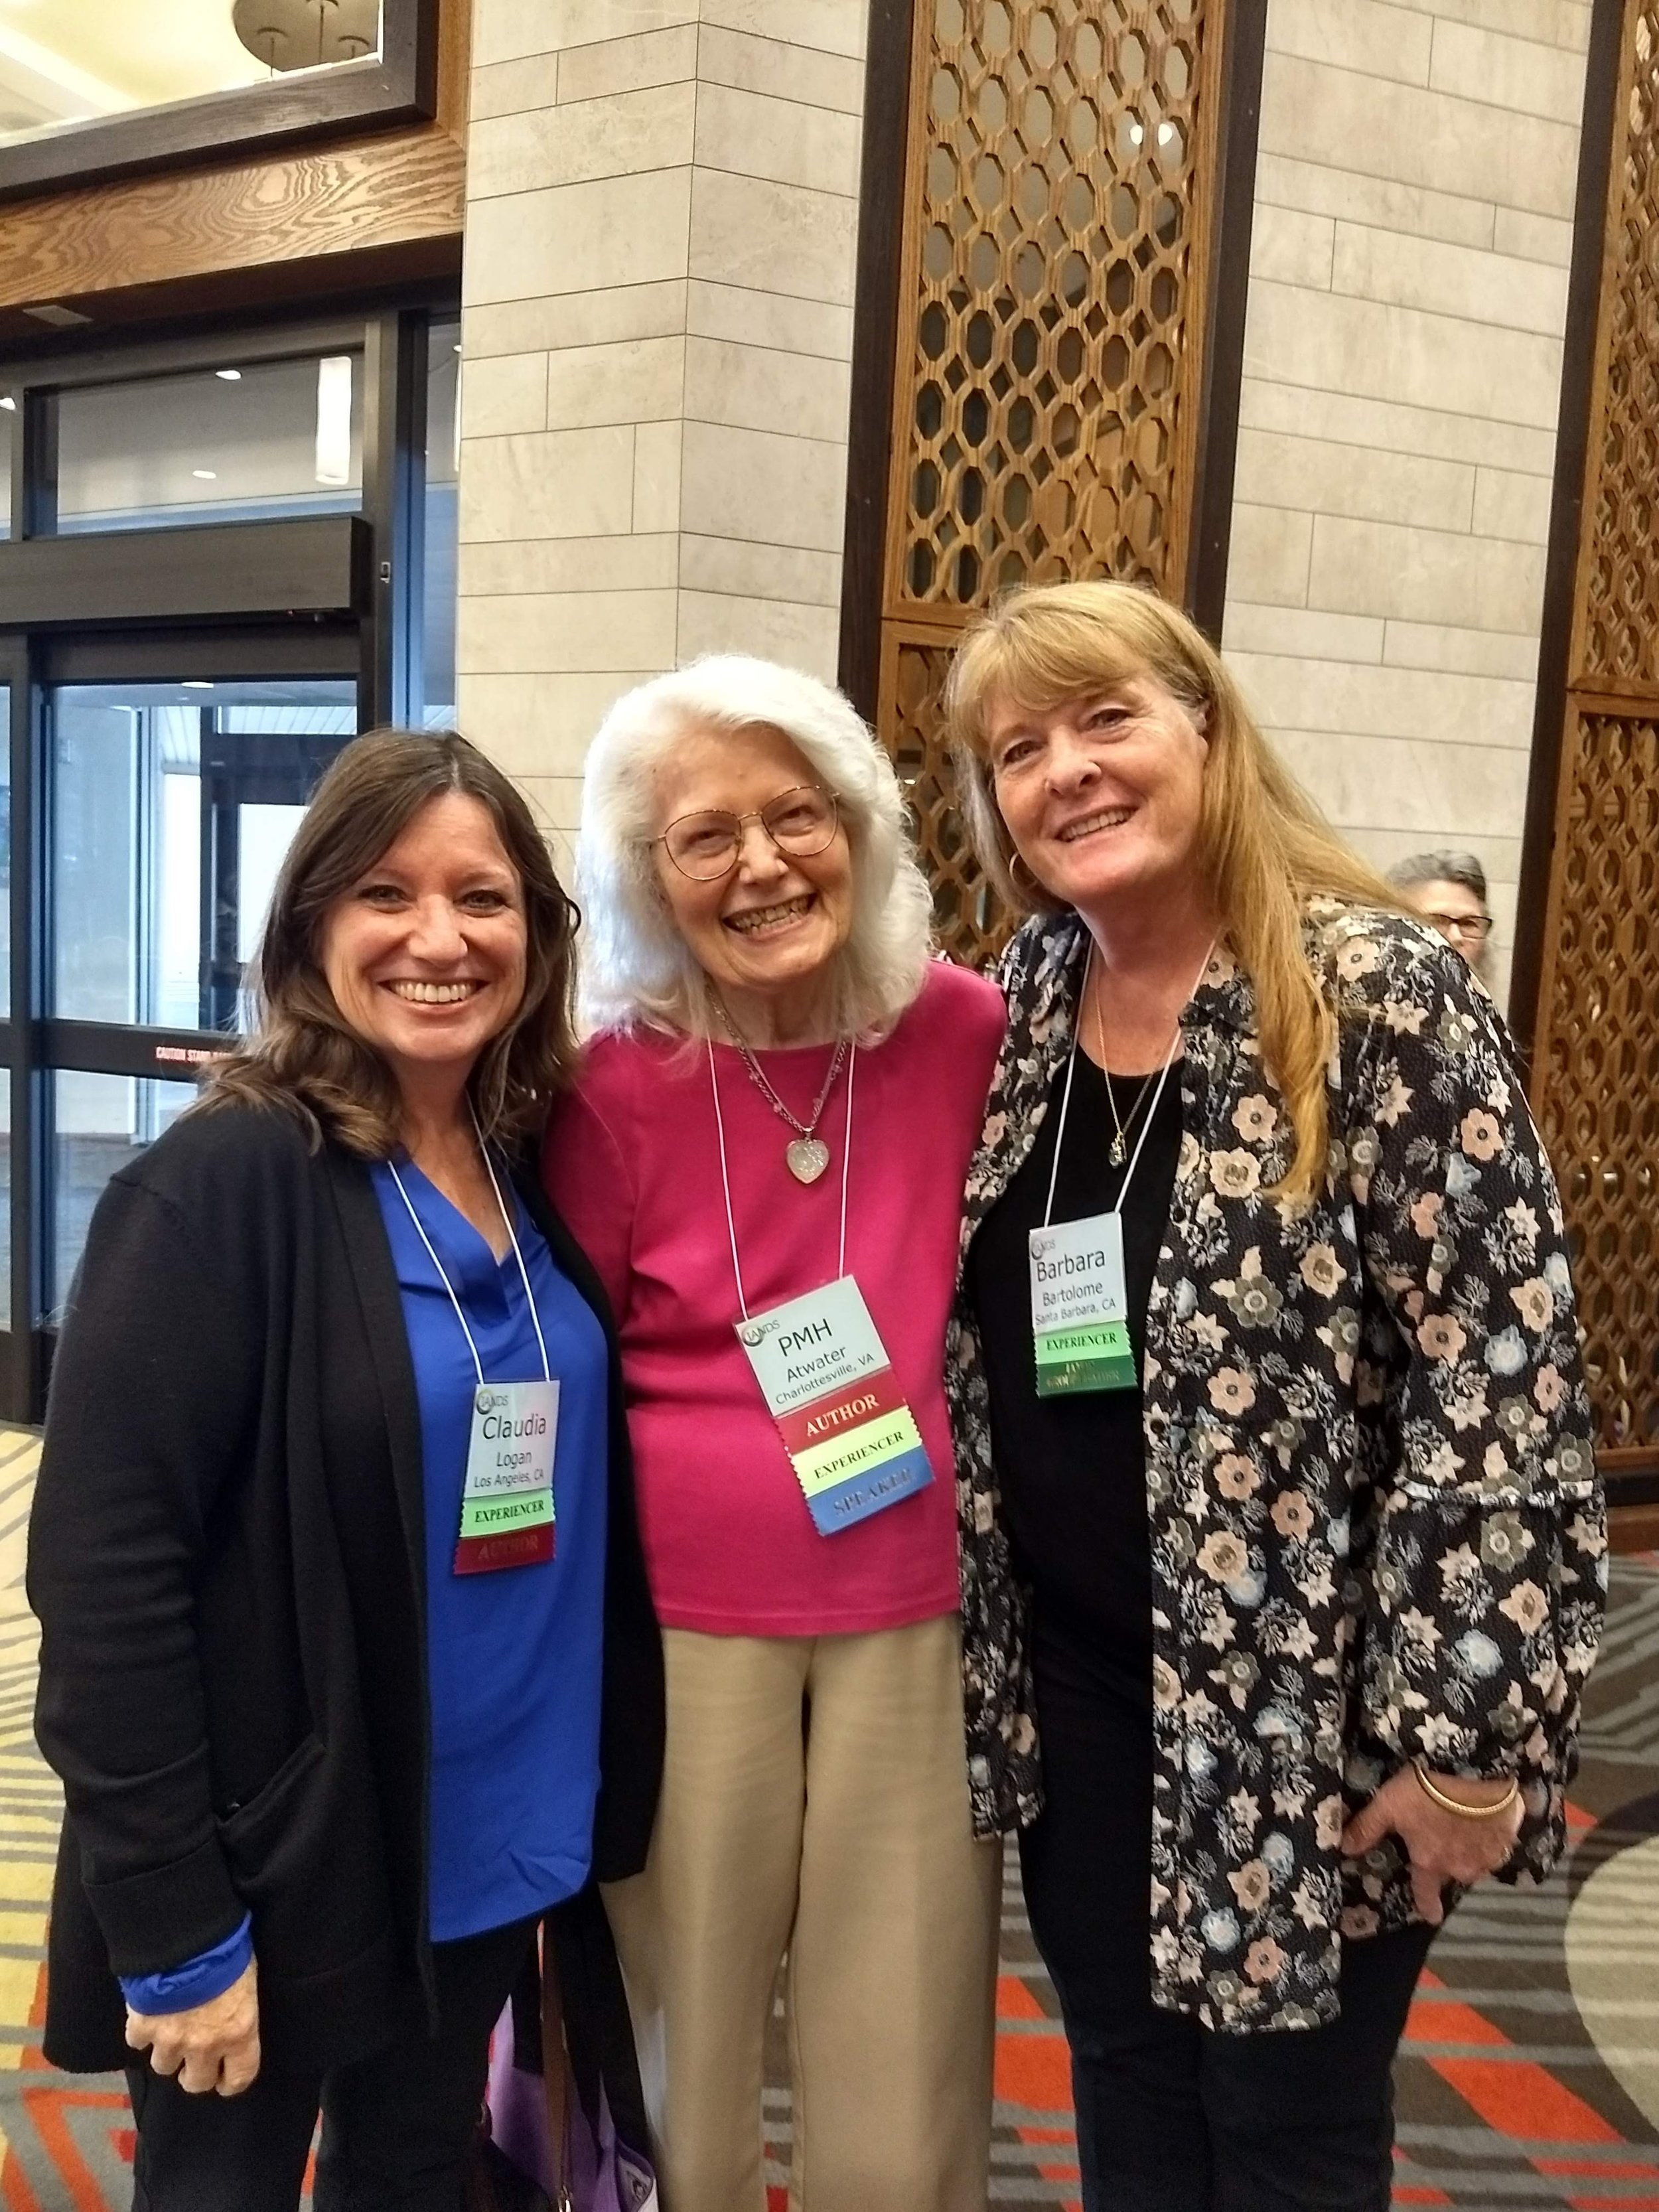 Claudia Logan, PMH Atwater and Barbara Bartolome